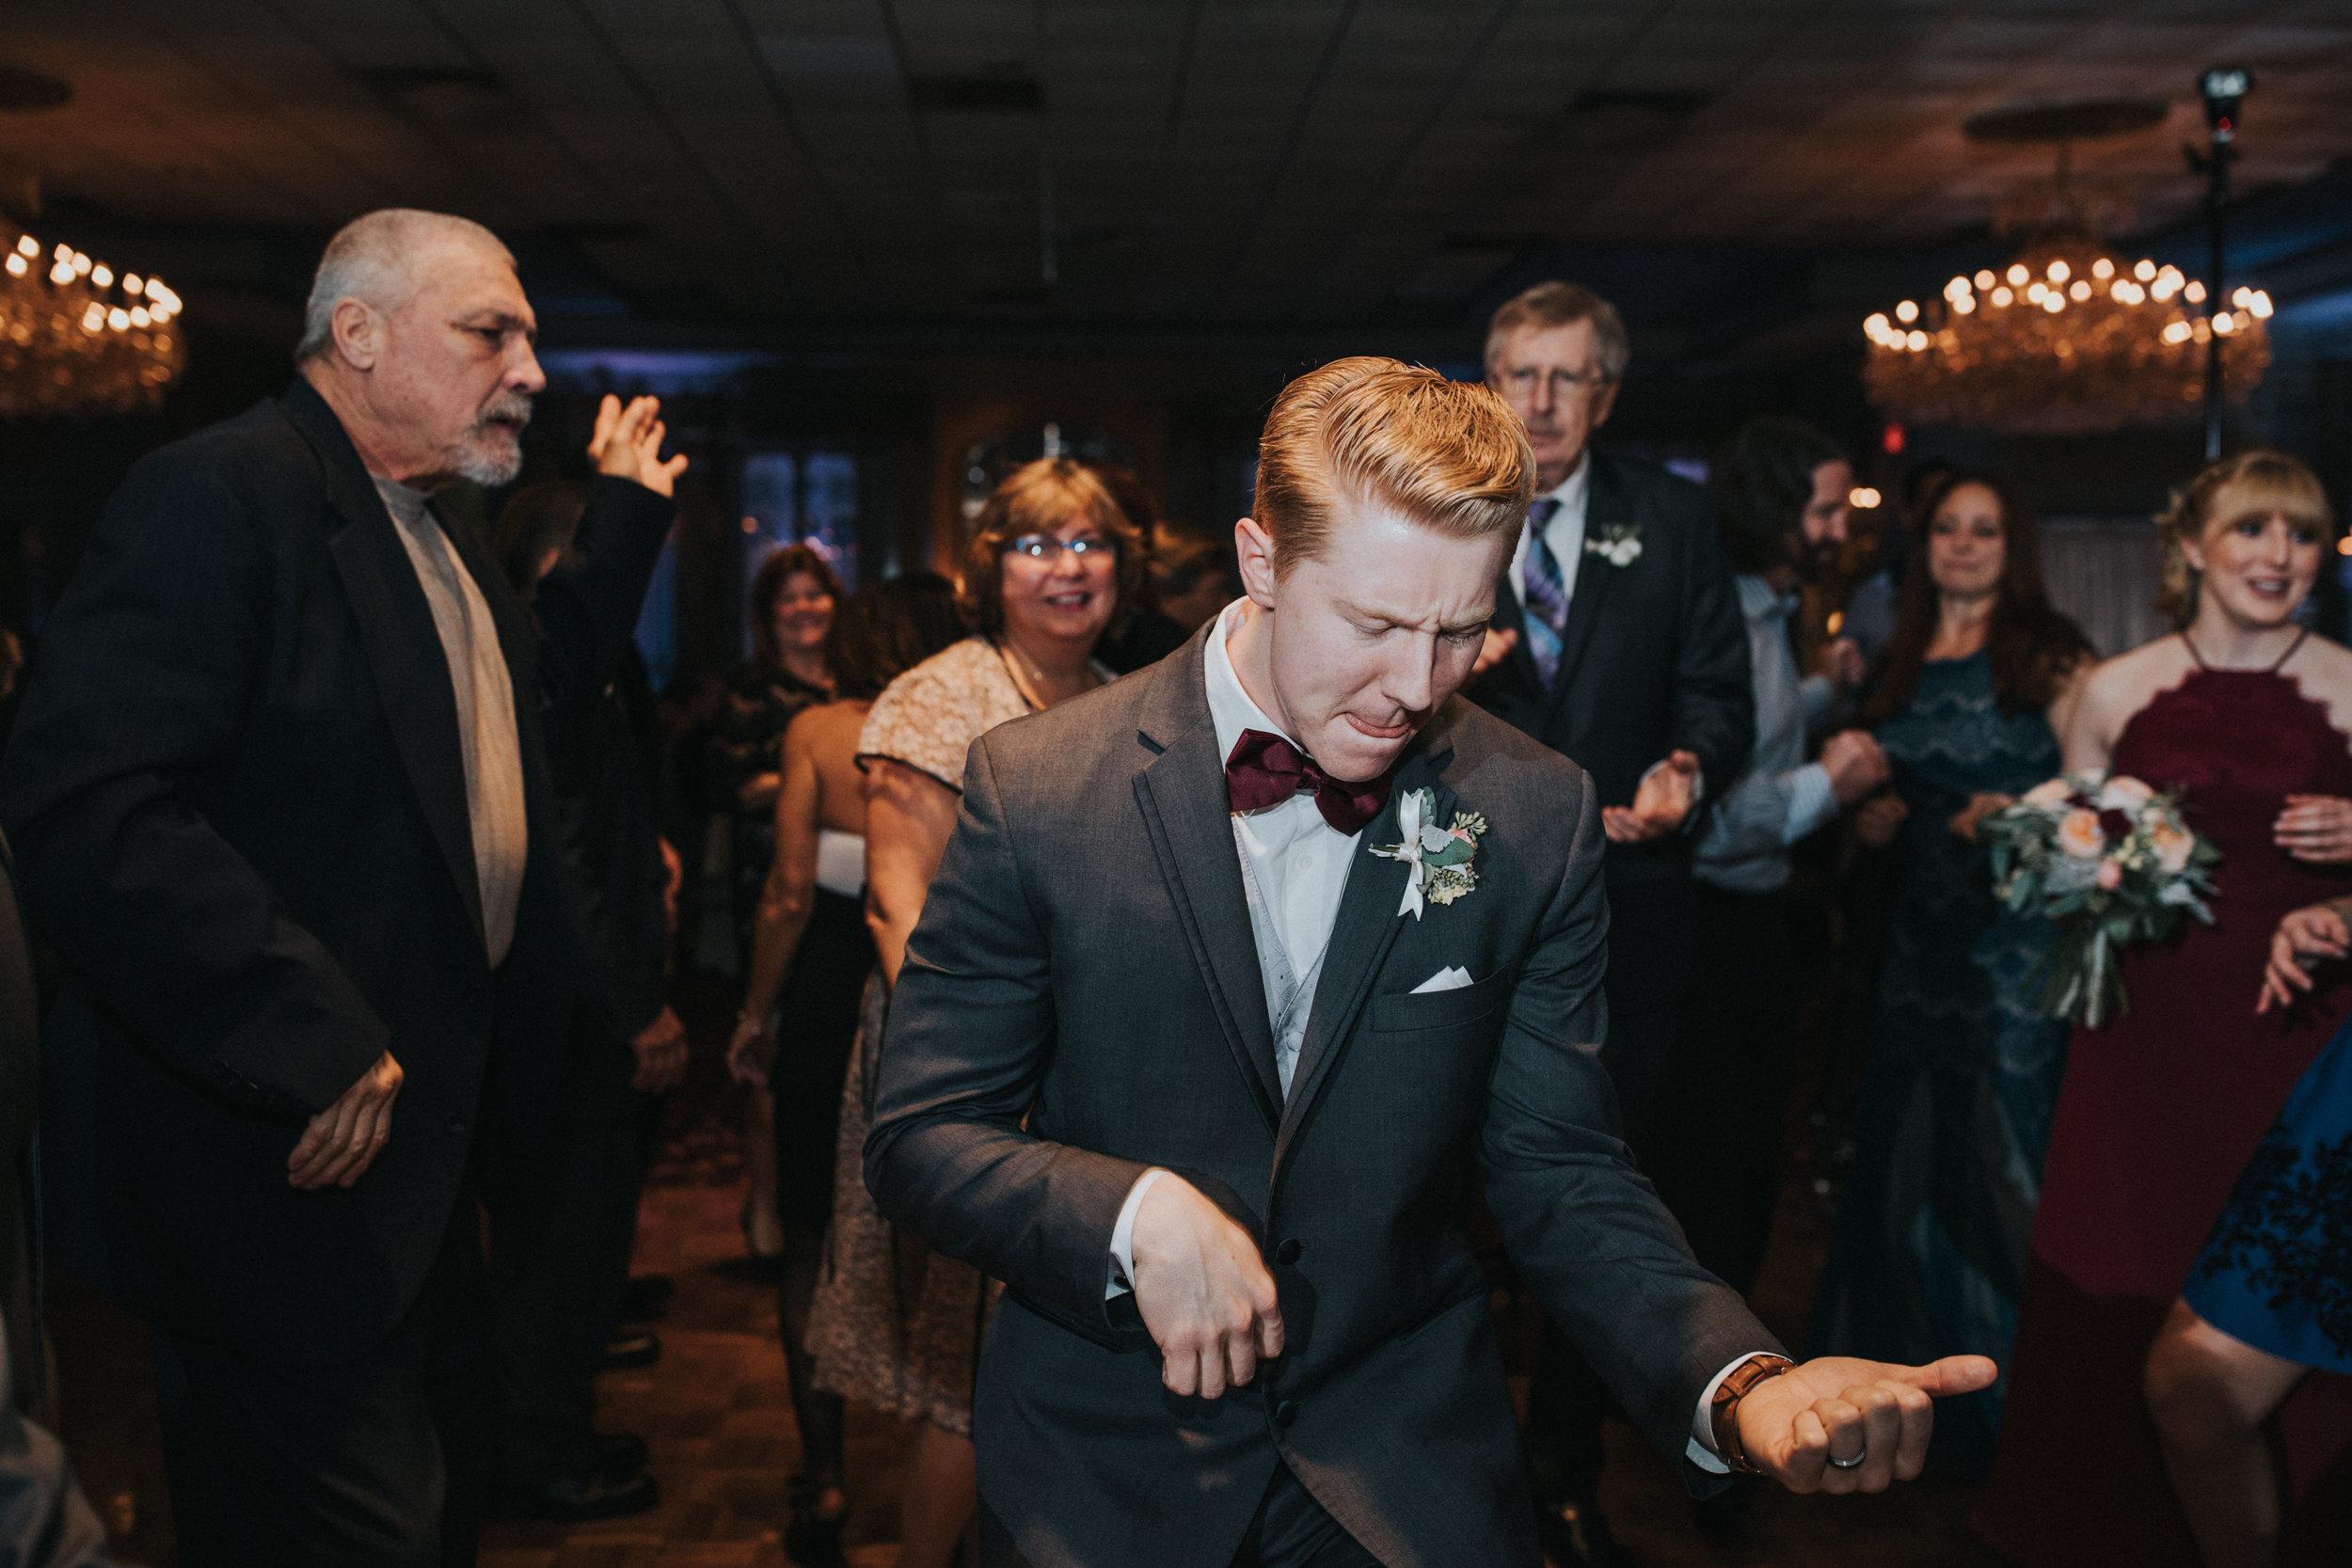 New-Jersey-Wedding-Photography-Fishers-Tudor-House-JennaLynnPhotography-Reception-Kathleen&Eddie-60.jpg